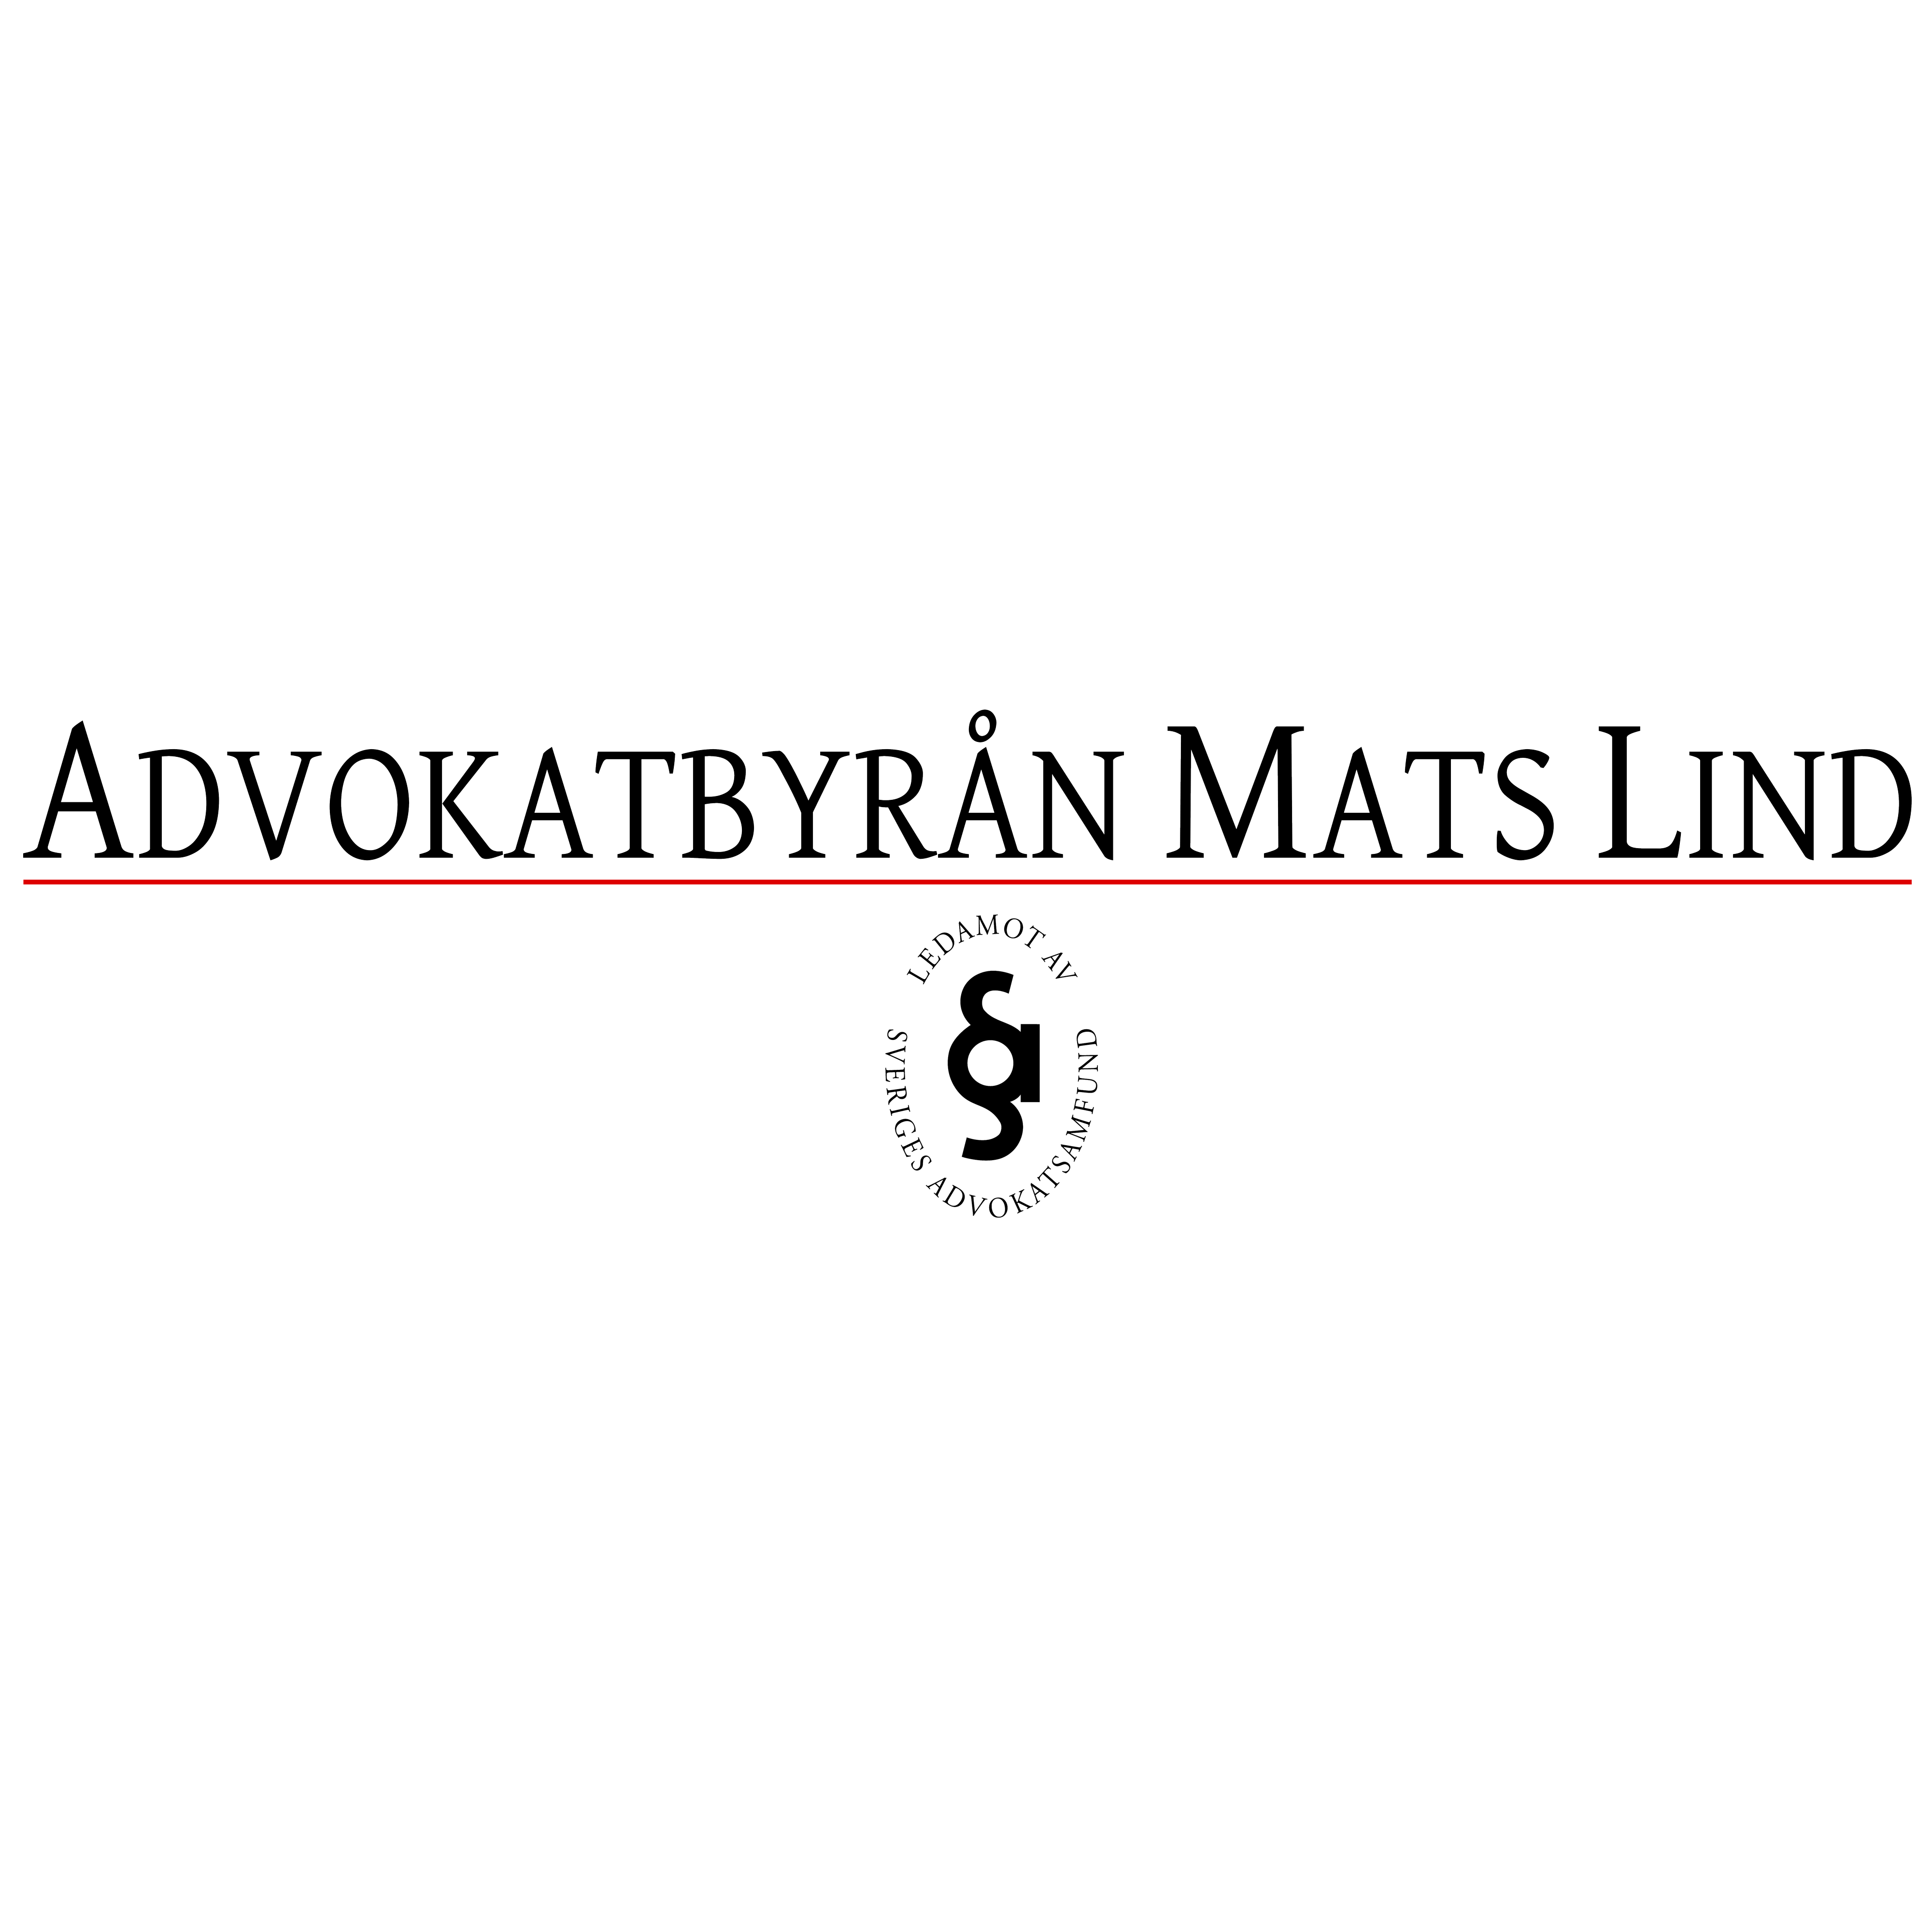 Advokatbyrån Mats Lind AB